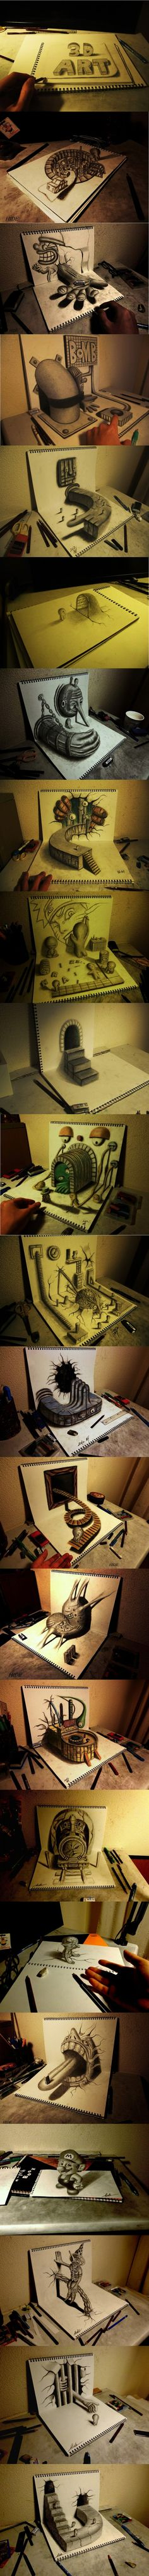 Incredible 3D Art By Japanese Artist Nagai Hideyuki